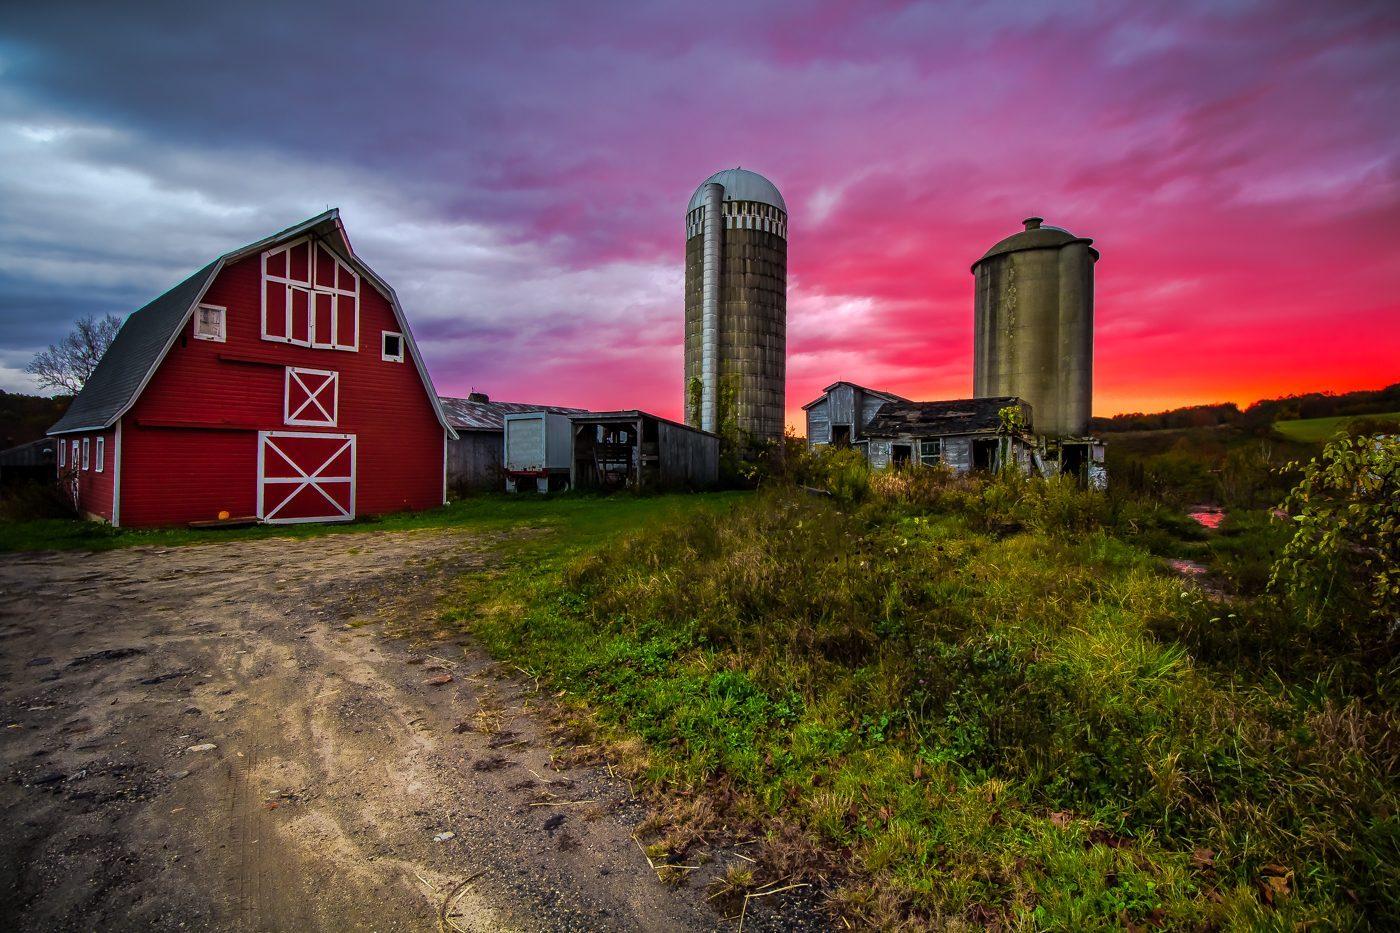 csa-signup-red-barn-e1520568546695